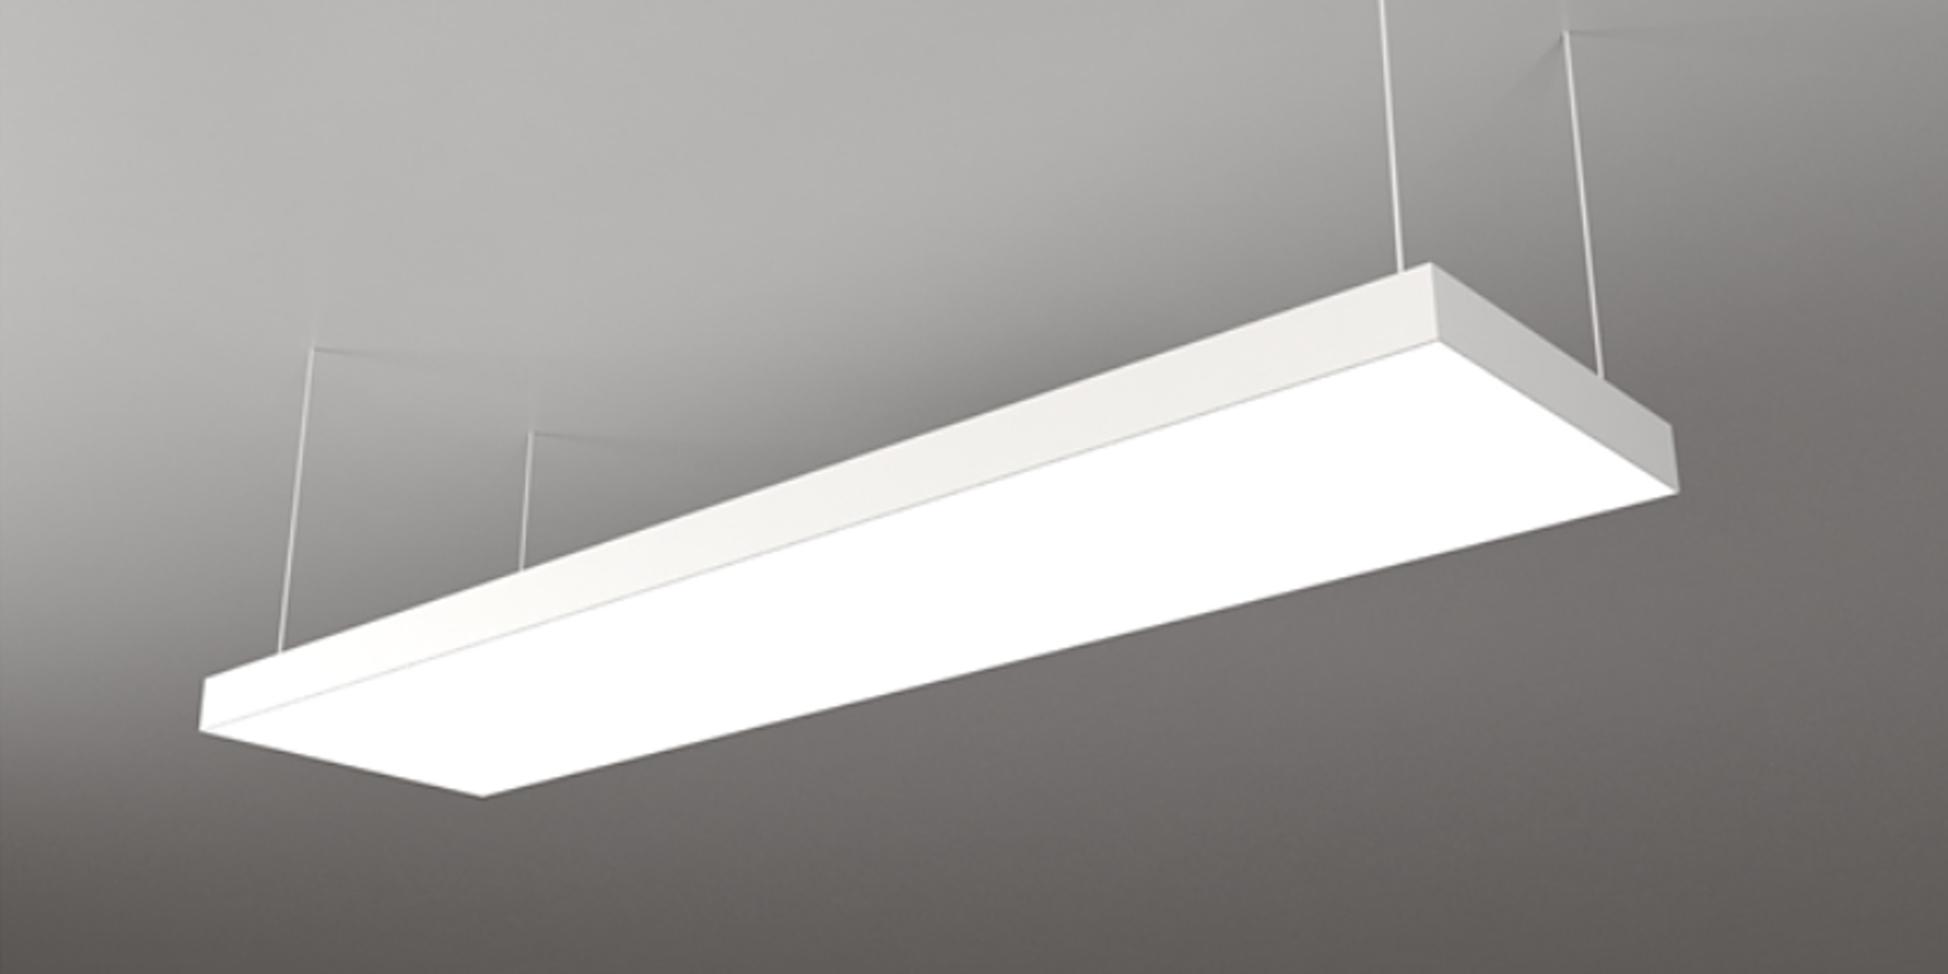 Linear Square Edge Design & Architectural Light Boxes u2013 JPR Lighting azcodes.com